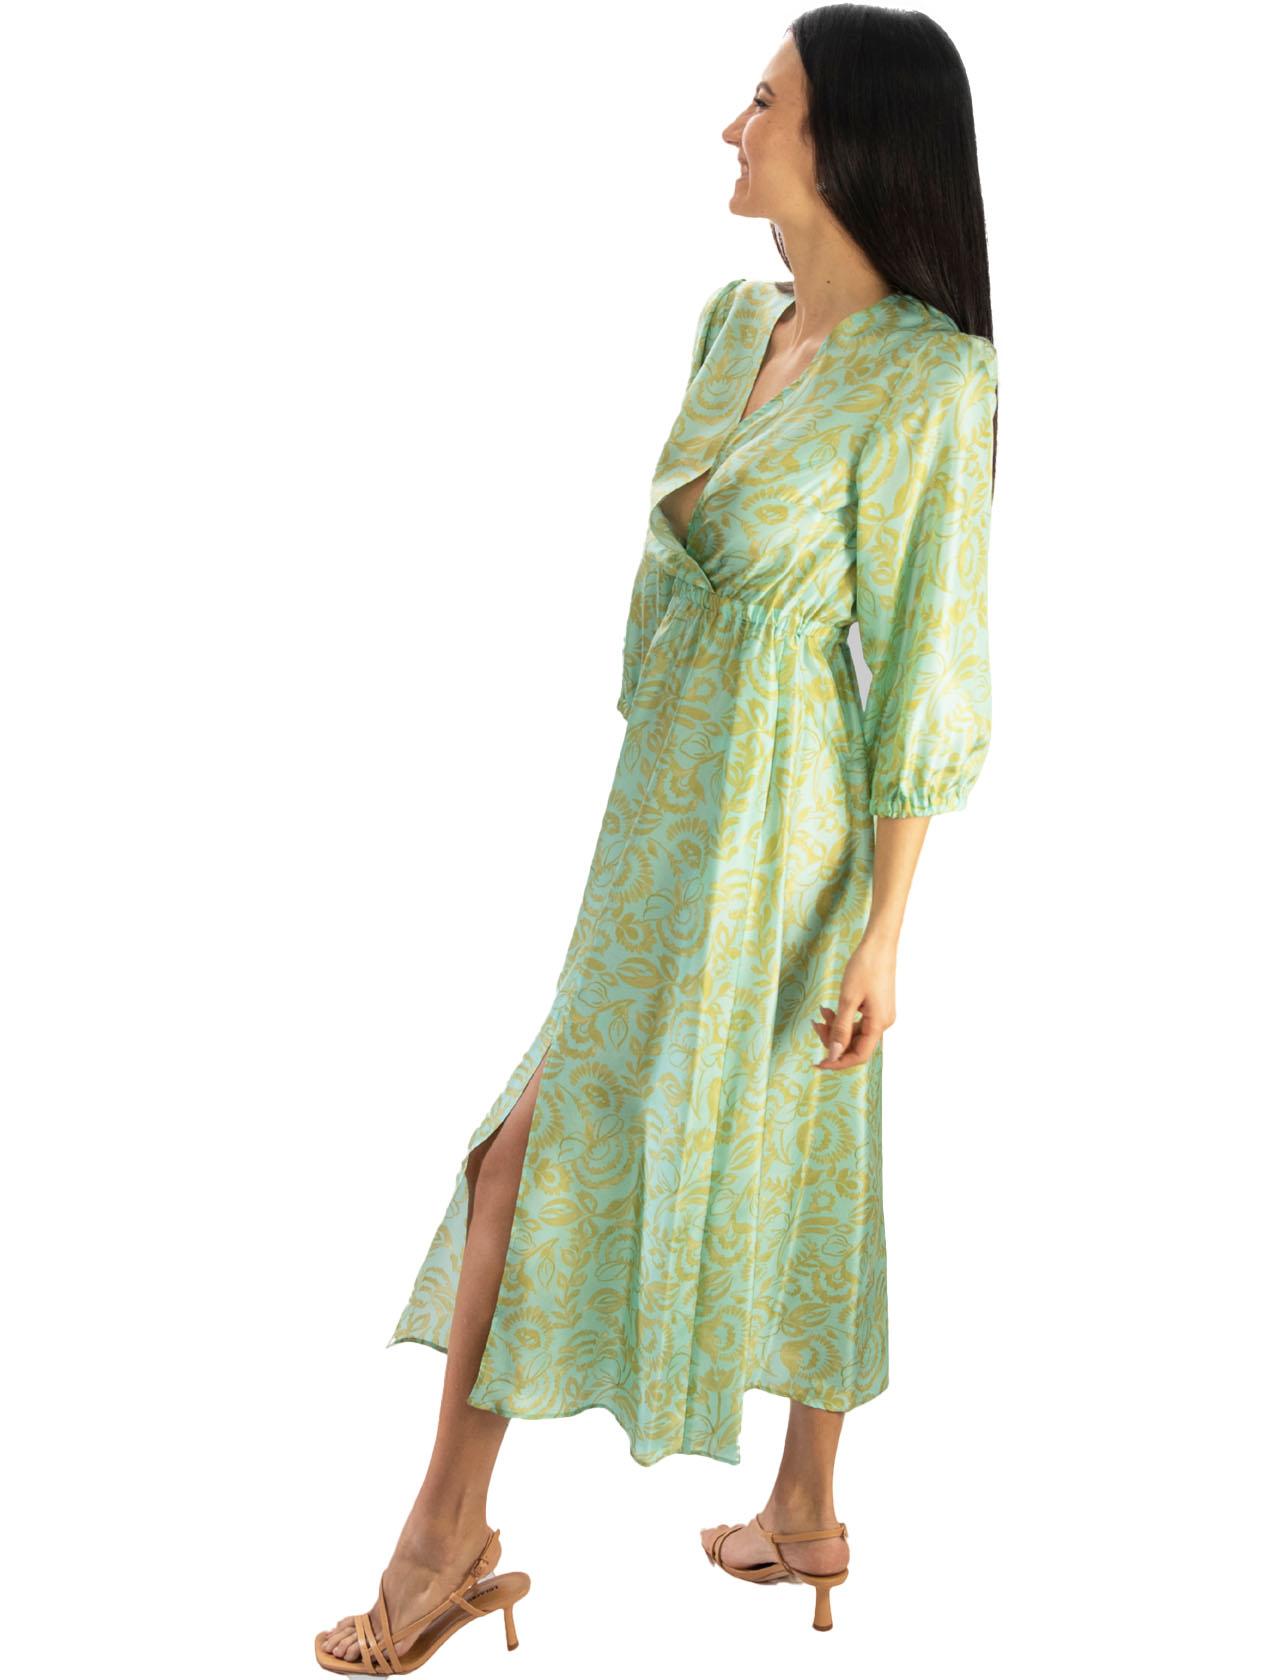 Women's Clothing Long Dress in Turkish Delight Silk Aqua and Gold Maliparmi   Dresses   JF645830111C6018